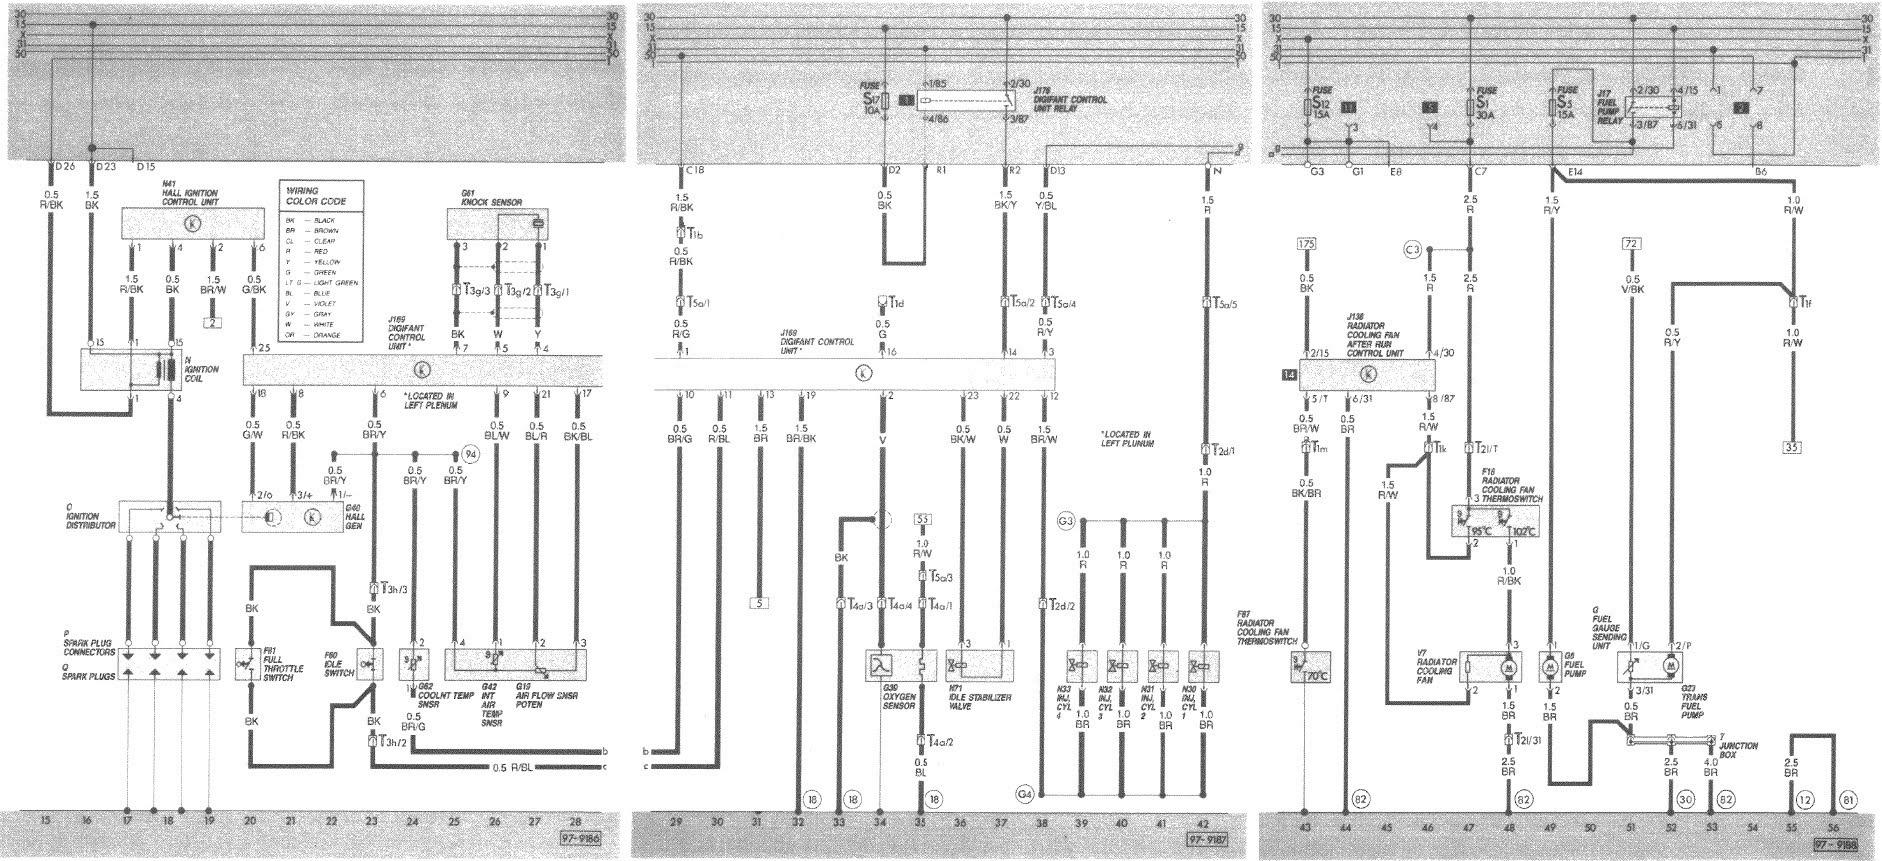 mk1 golf ignition wiring diagram warn winch 2 solenoid volkswagen 20 artatec automobile de vw diagrams hits rh 51 ale baltic rallye 4 pdf